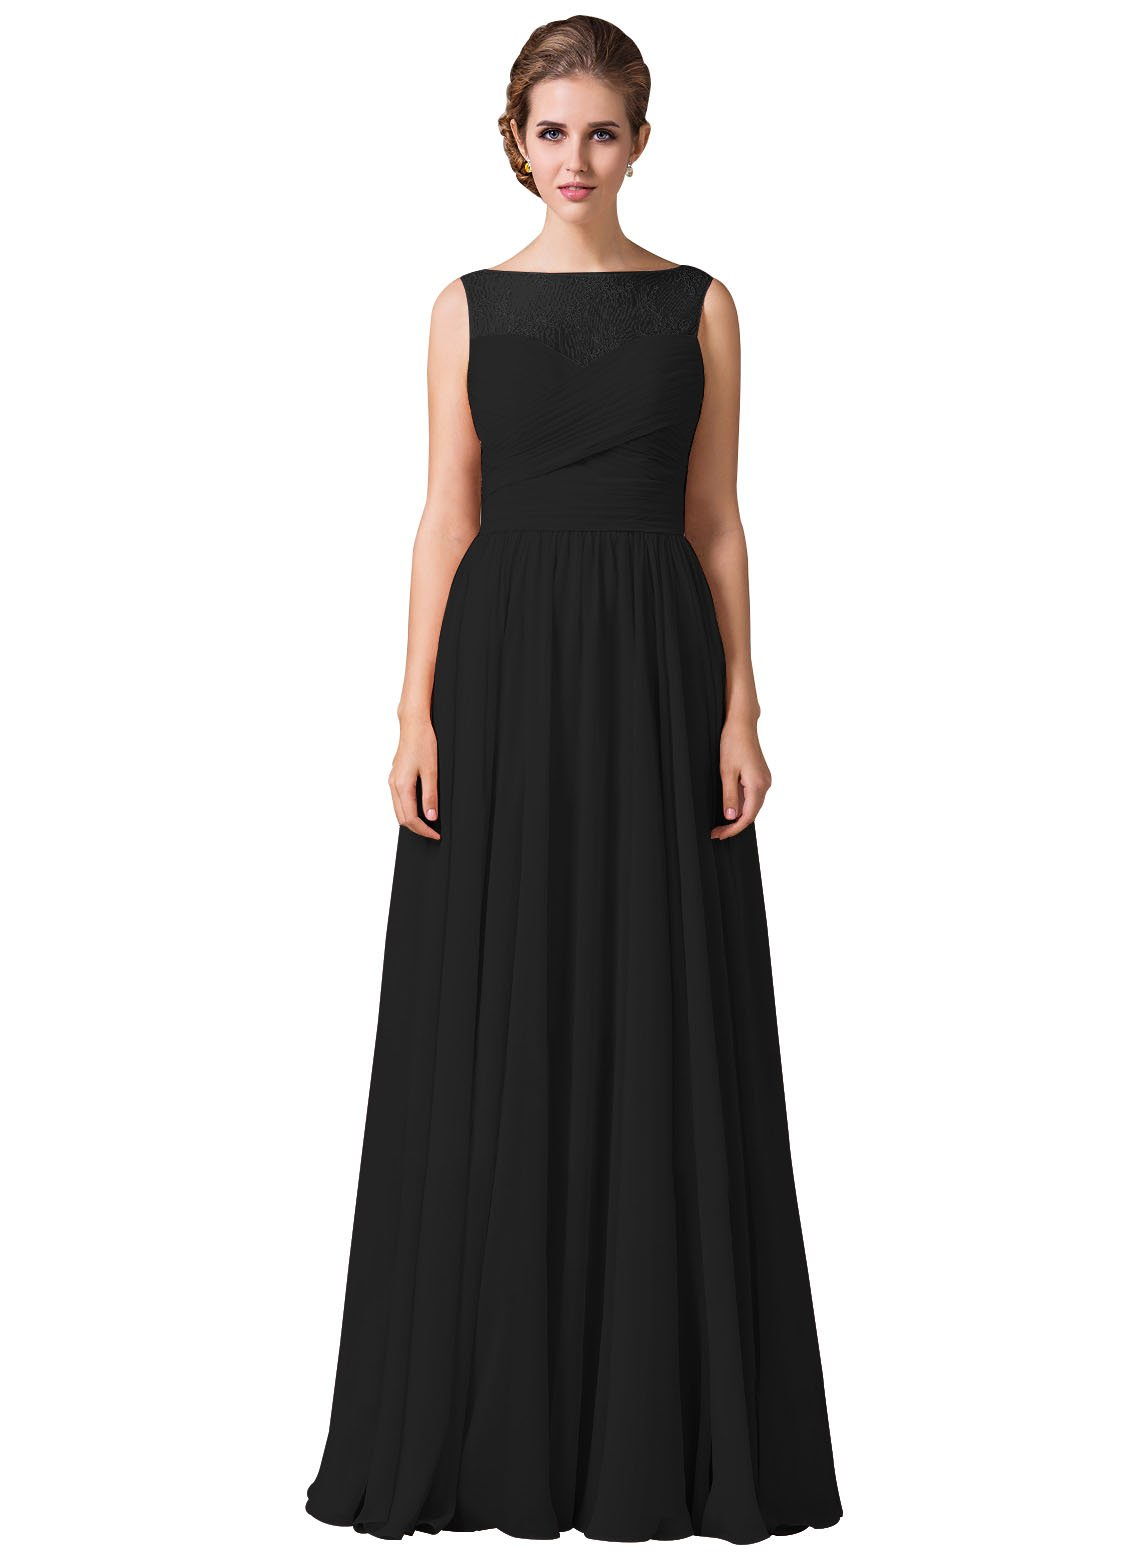 Loffy Women's Bridesmaid Dress Lace With Shoulder Black Size 12